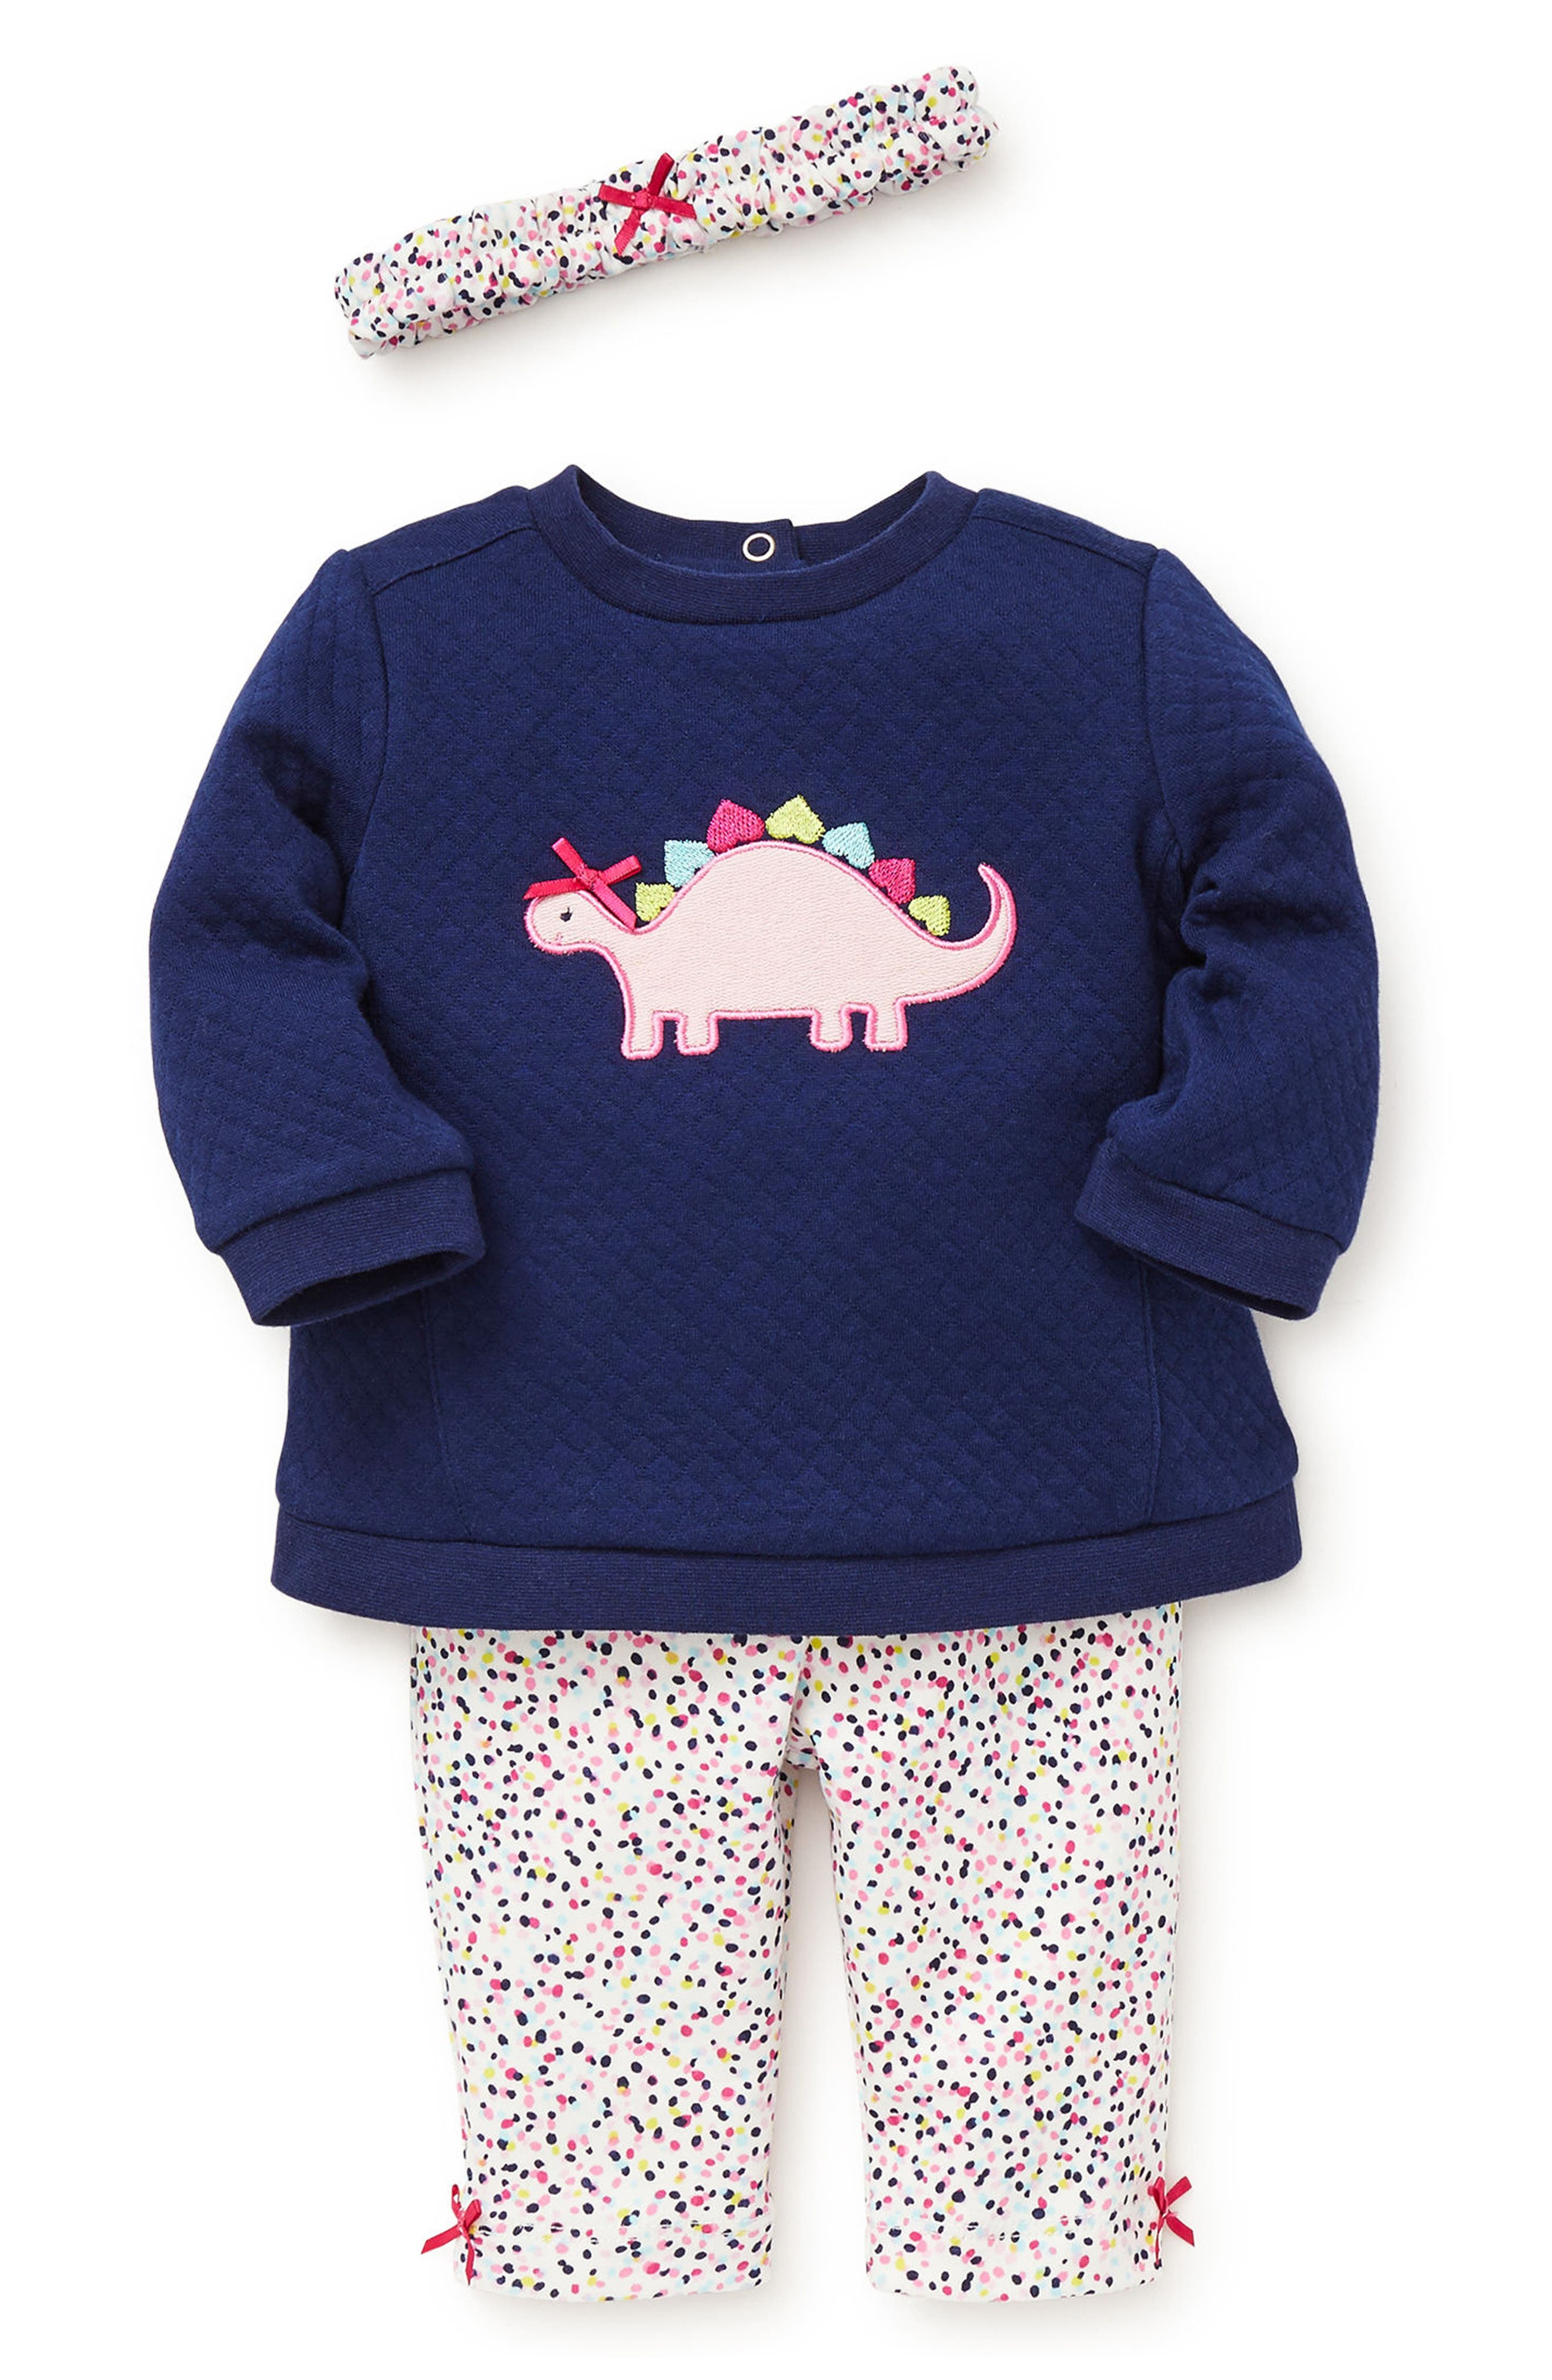 Dino Quilted Sweatshirt, Leggings & Headband Set,                             Main thumbnail 1, color,                             459